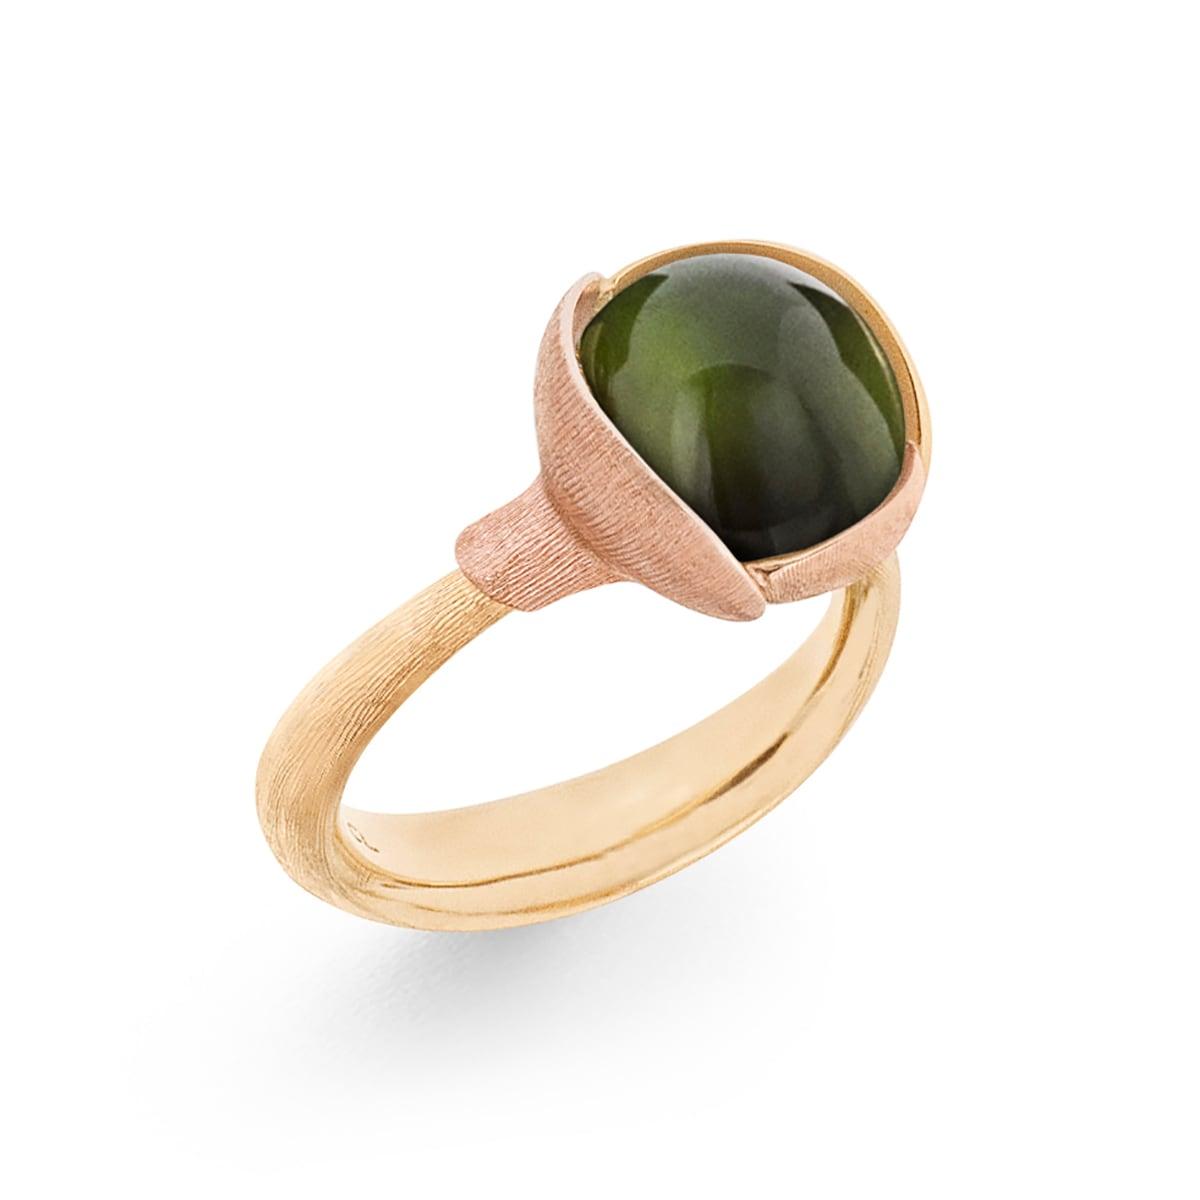 Ole_Lynggaard_Lotus_Ring 2_Green Tourmaline_A2651-412_V2_hos_Jarl_Sandin